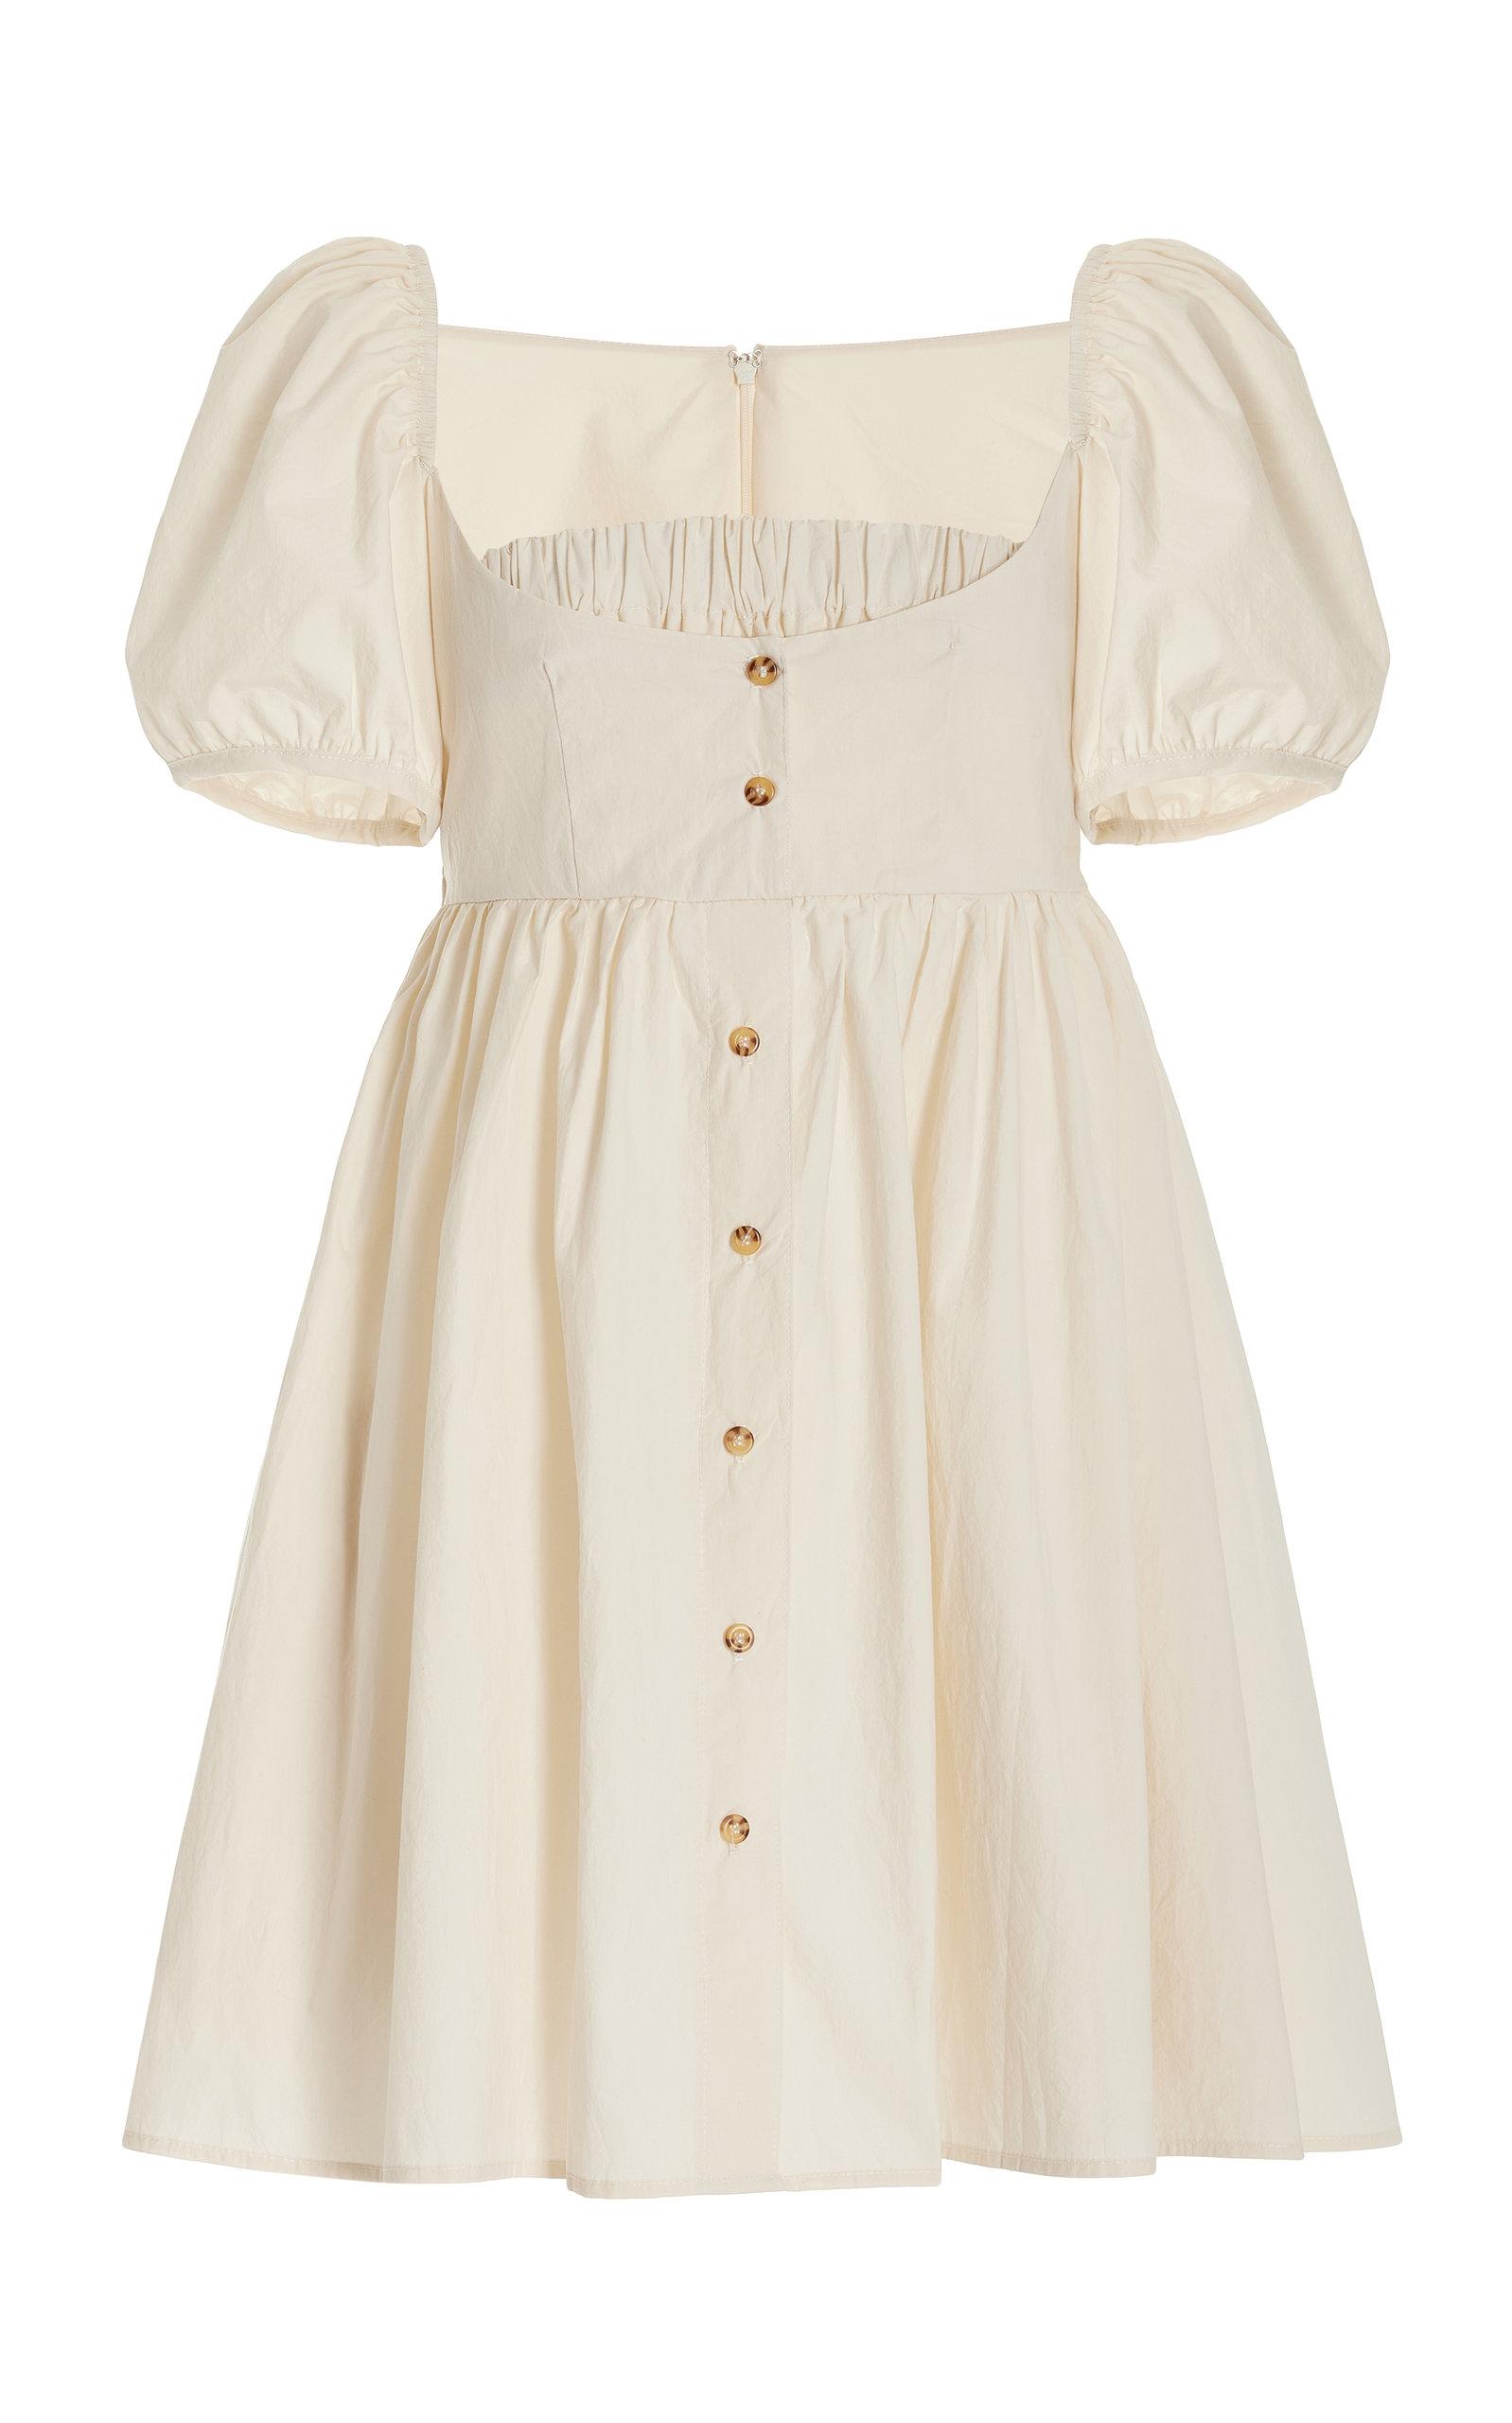 Women's Diana Button-Detailed Cotton Mini Dress